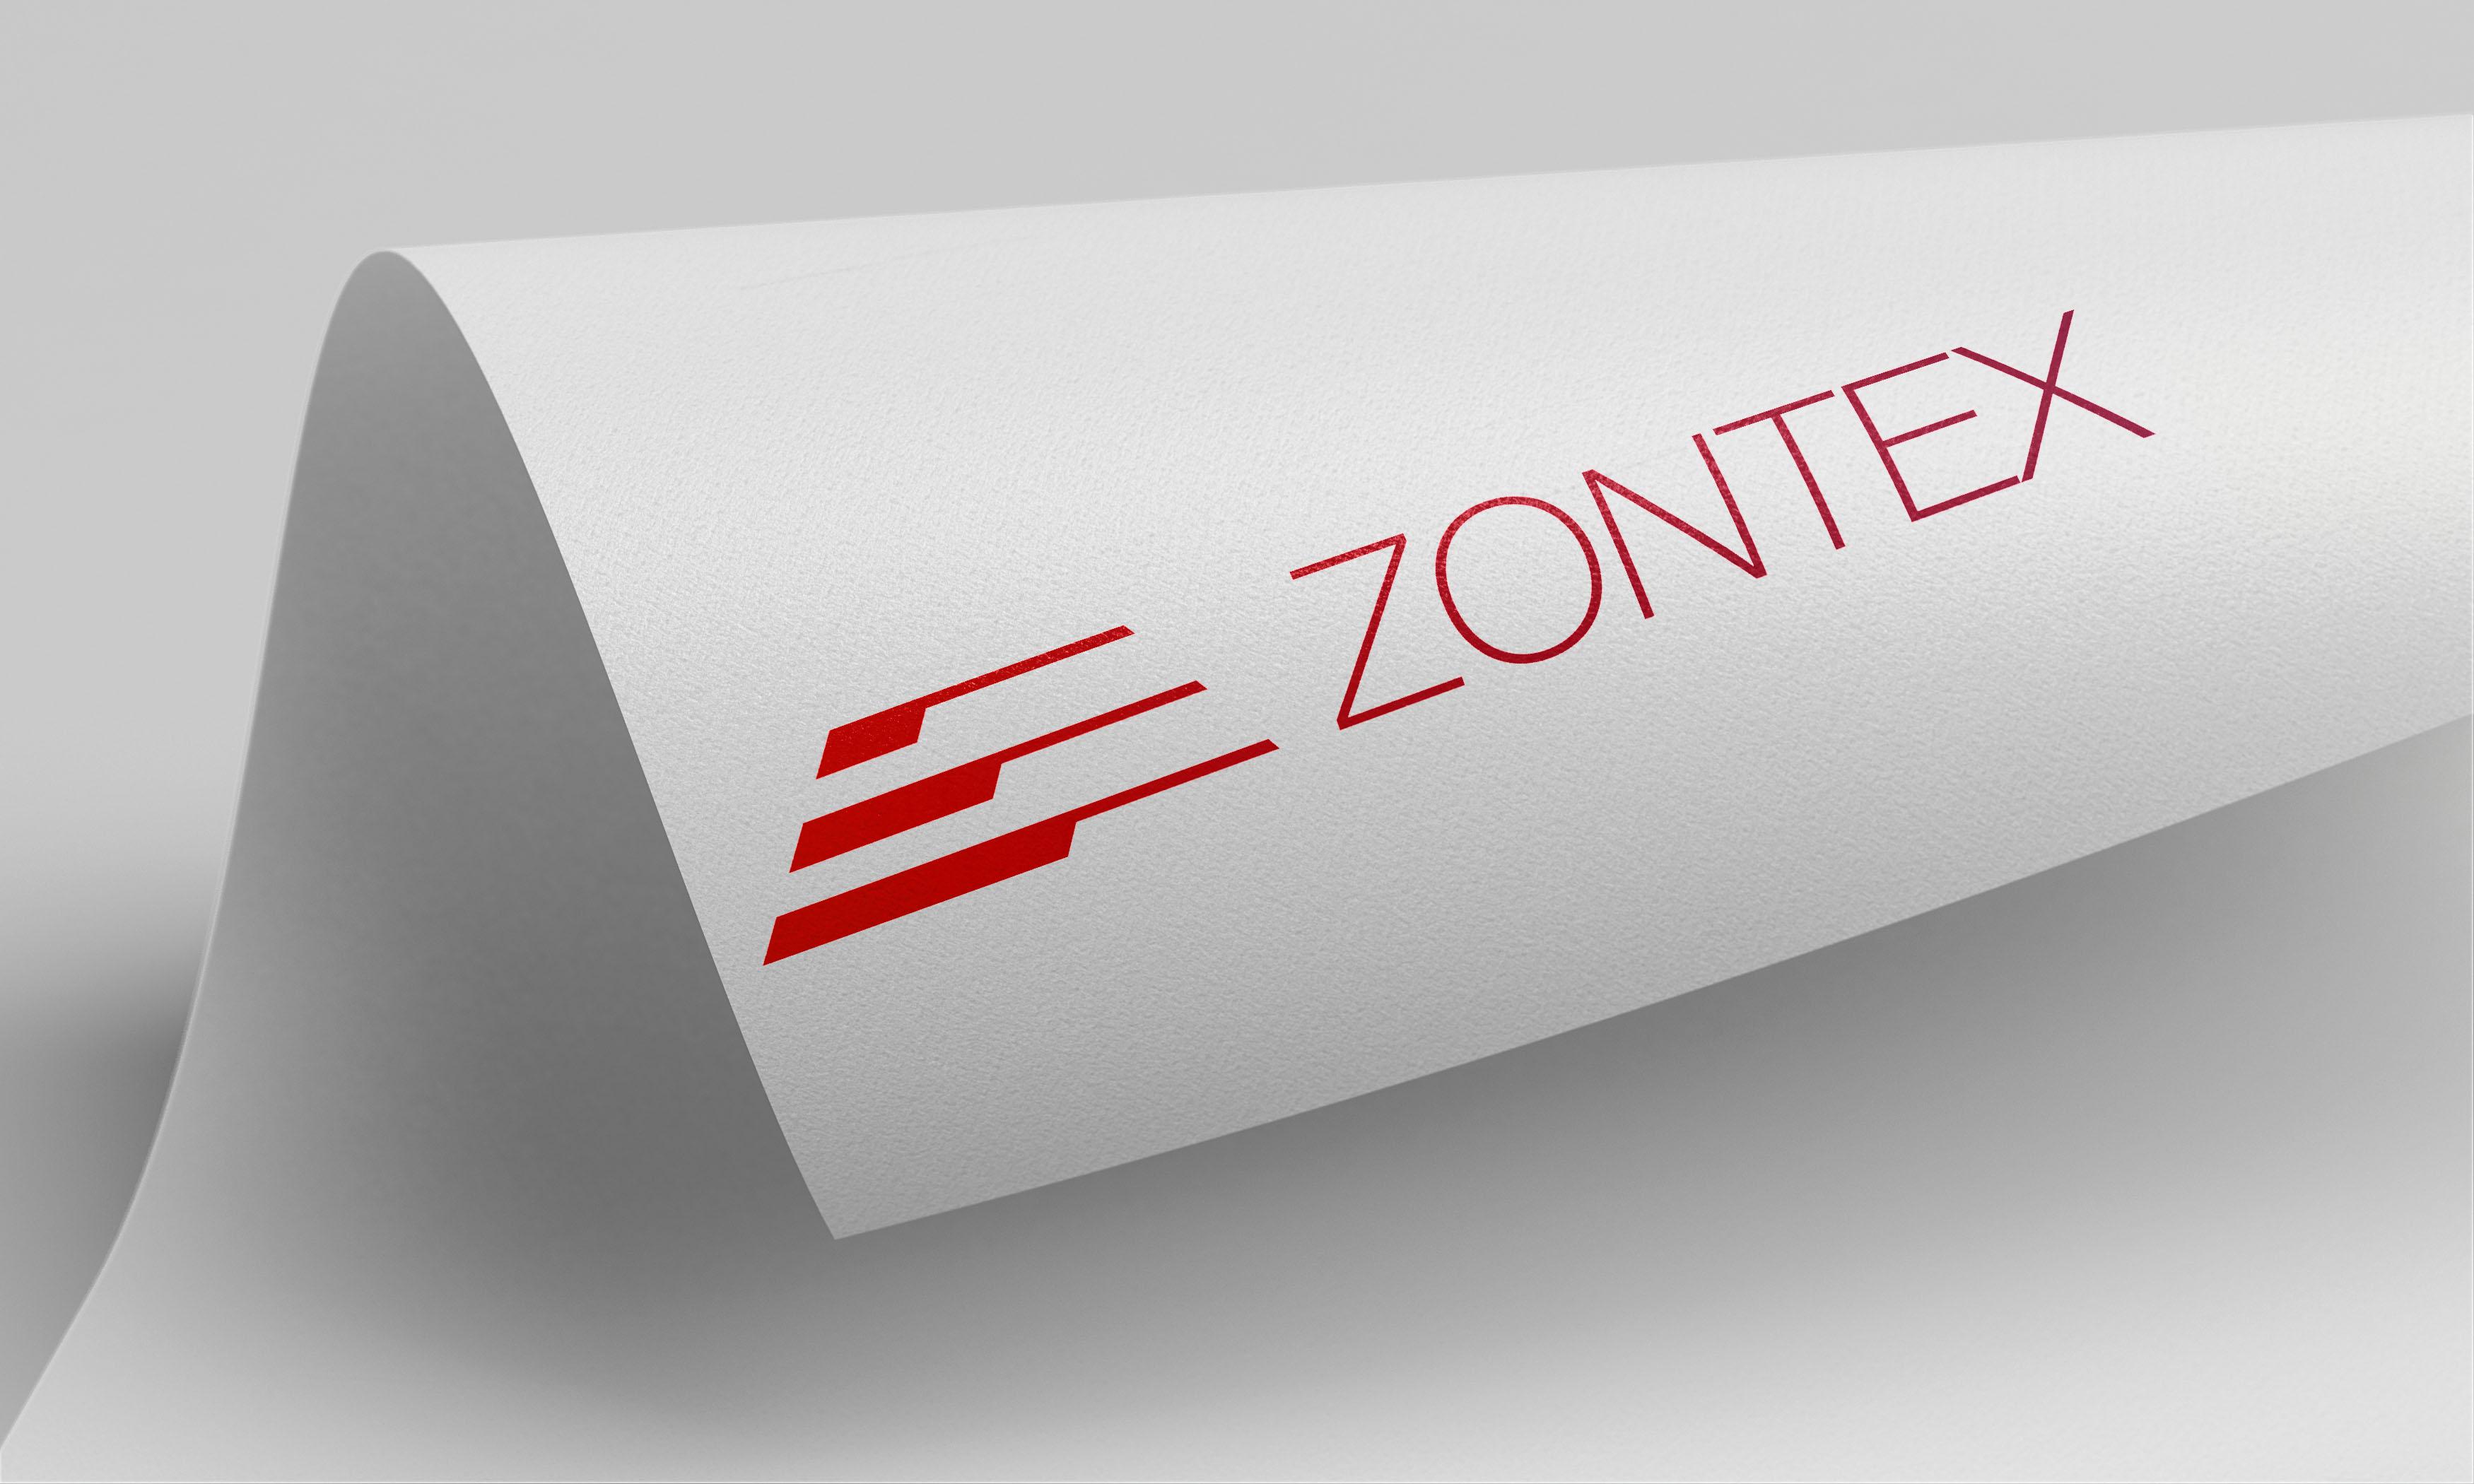 Логотип для интернет проекта фото f_6455a2bf75dd4746.jpg